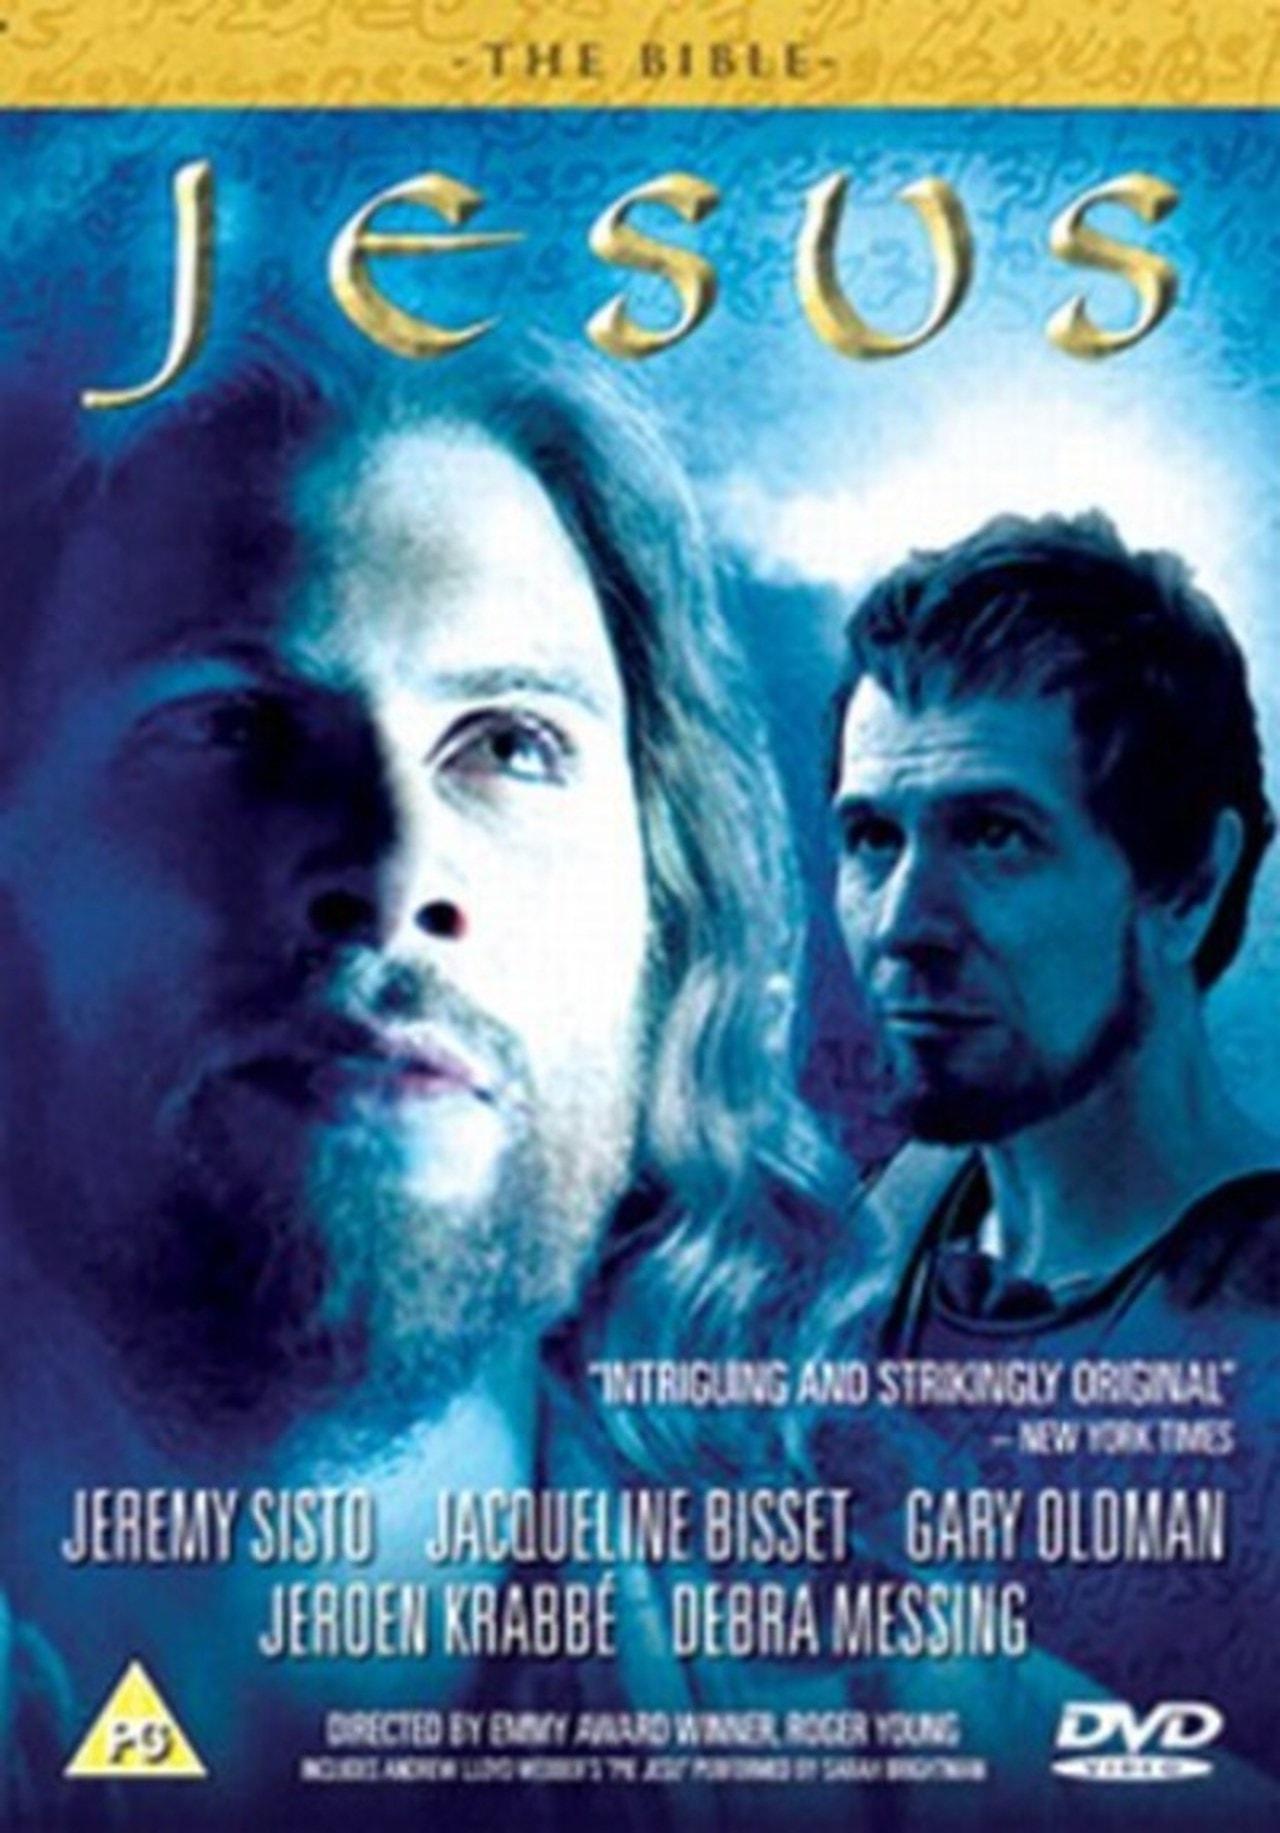 The Bible: Jesus - 1